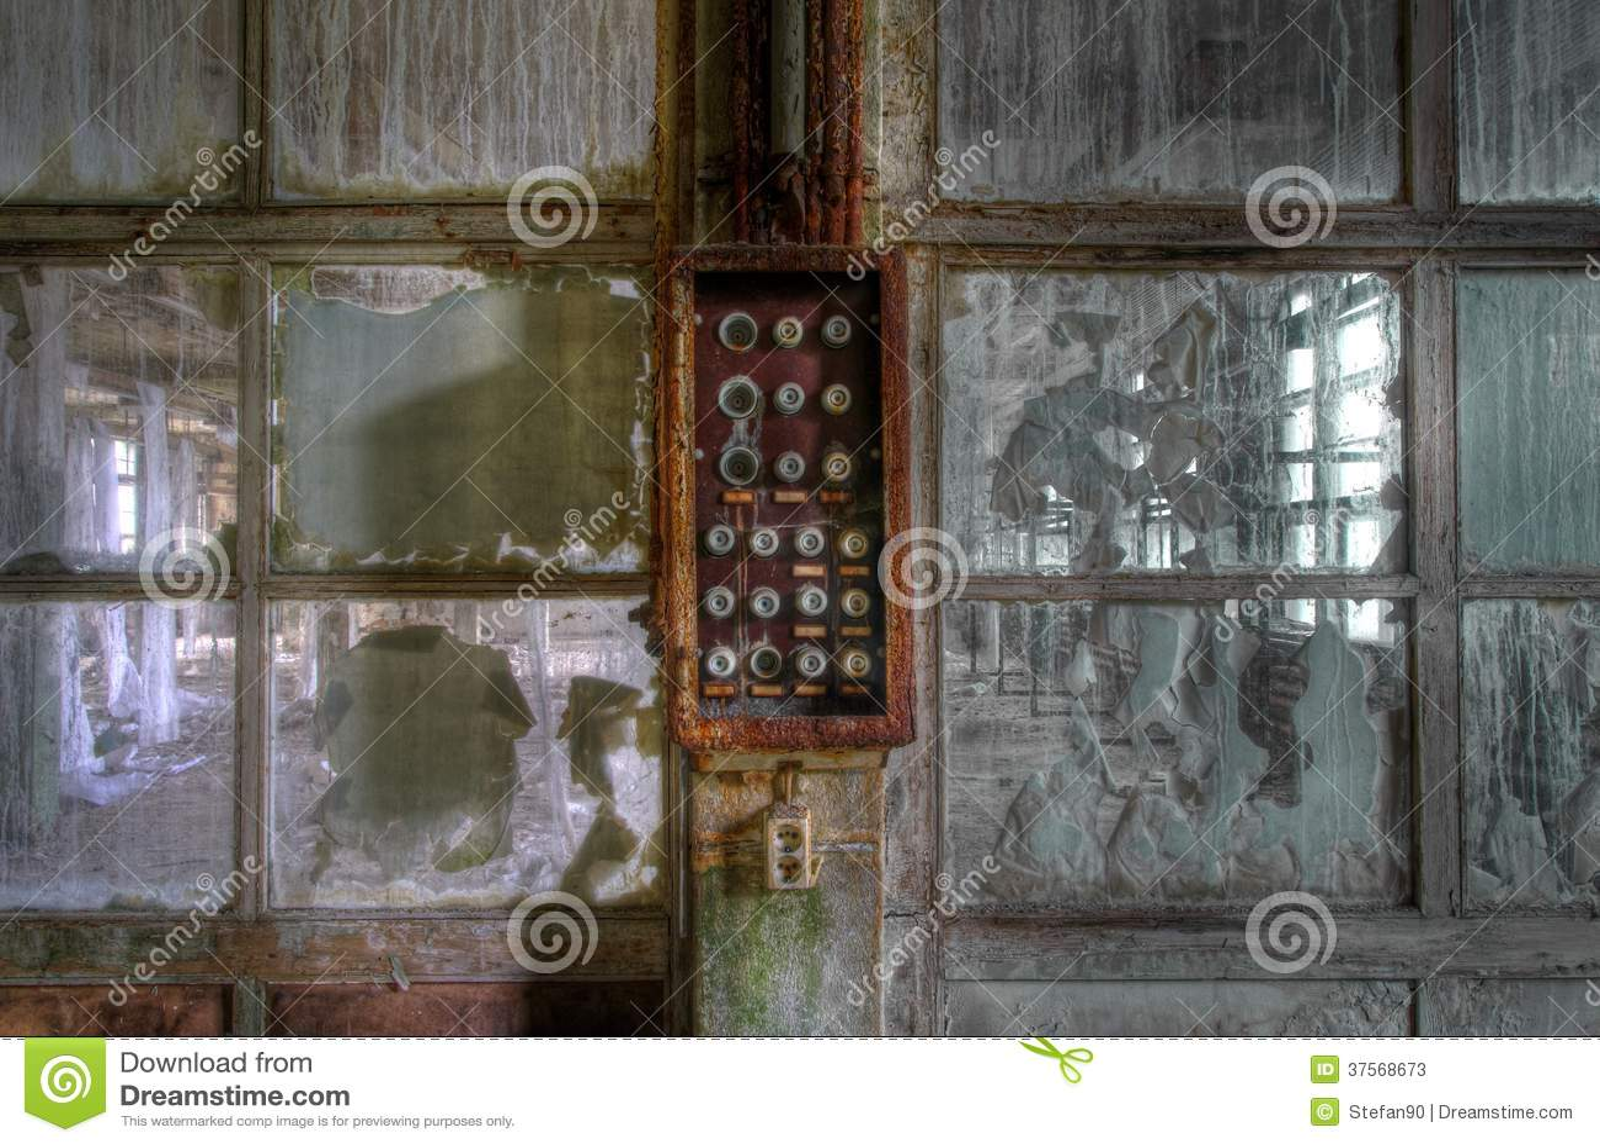 [DIAGRAM_38ZD]  A602A Old Home Fuse Box Diagram | Wiring Library | Destroyed Fuse Box |  | Wiring Library